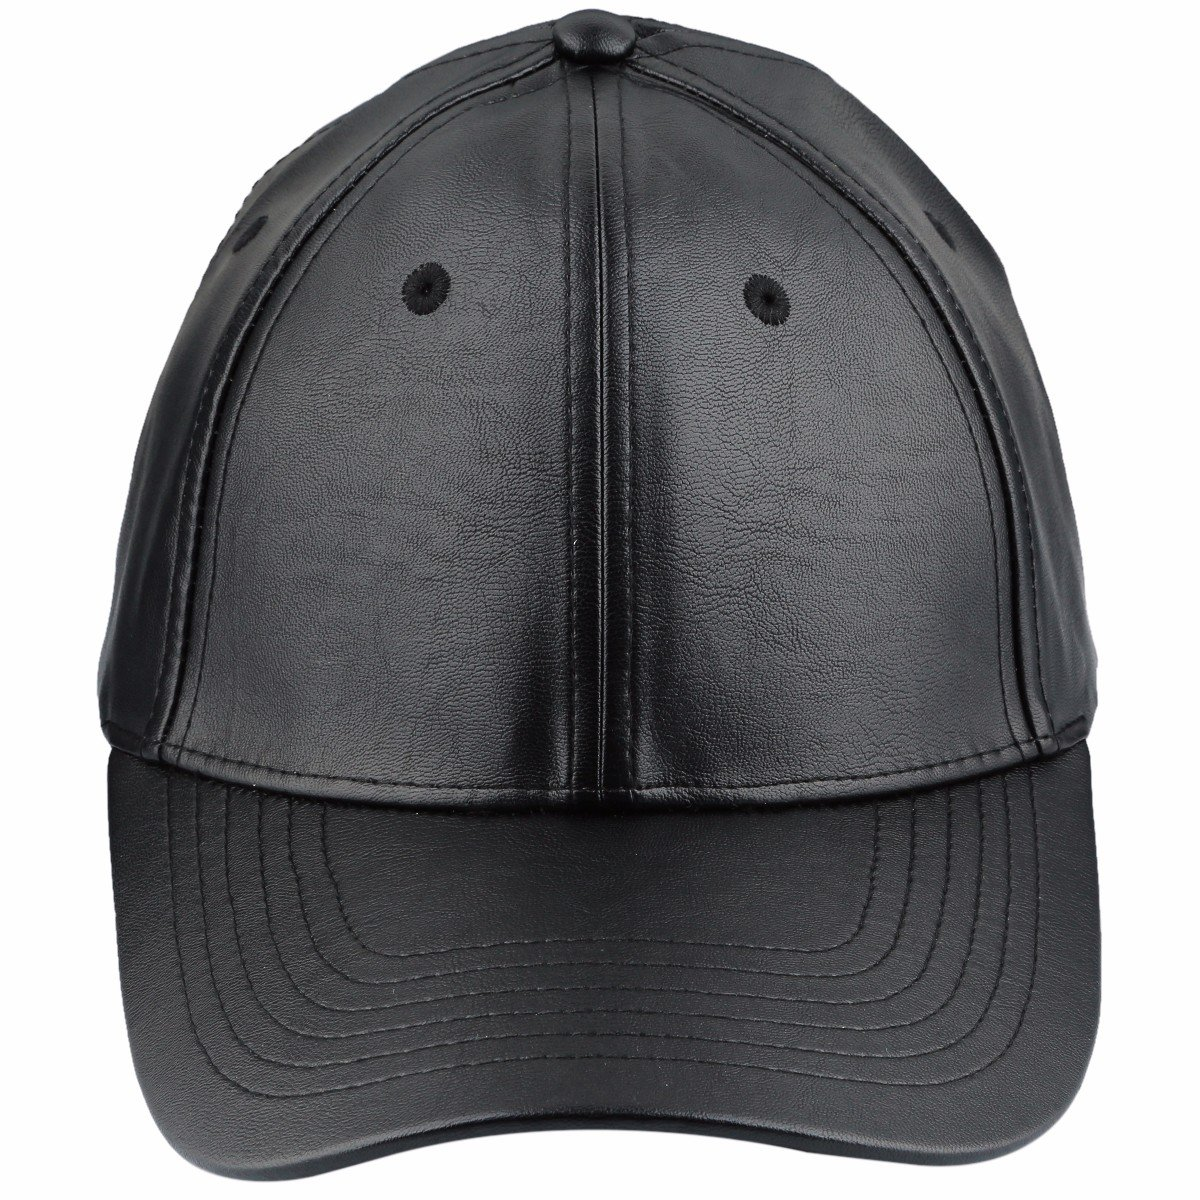 34d68bec810 Amazon.com  Samtree Unisex Baseball Cap